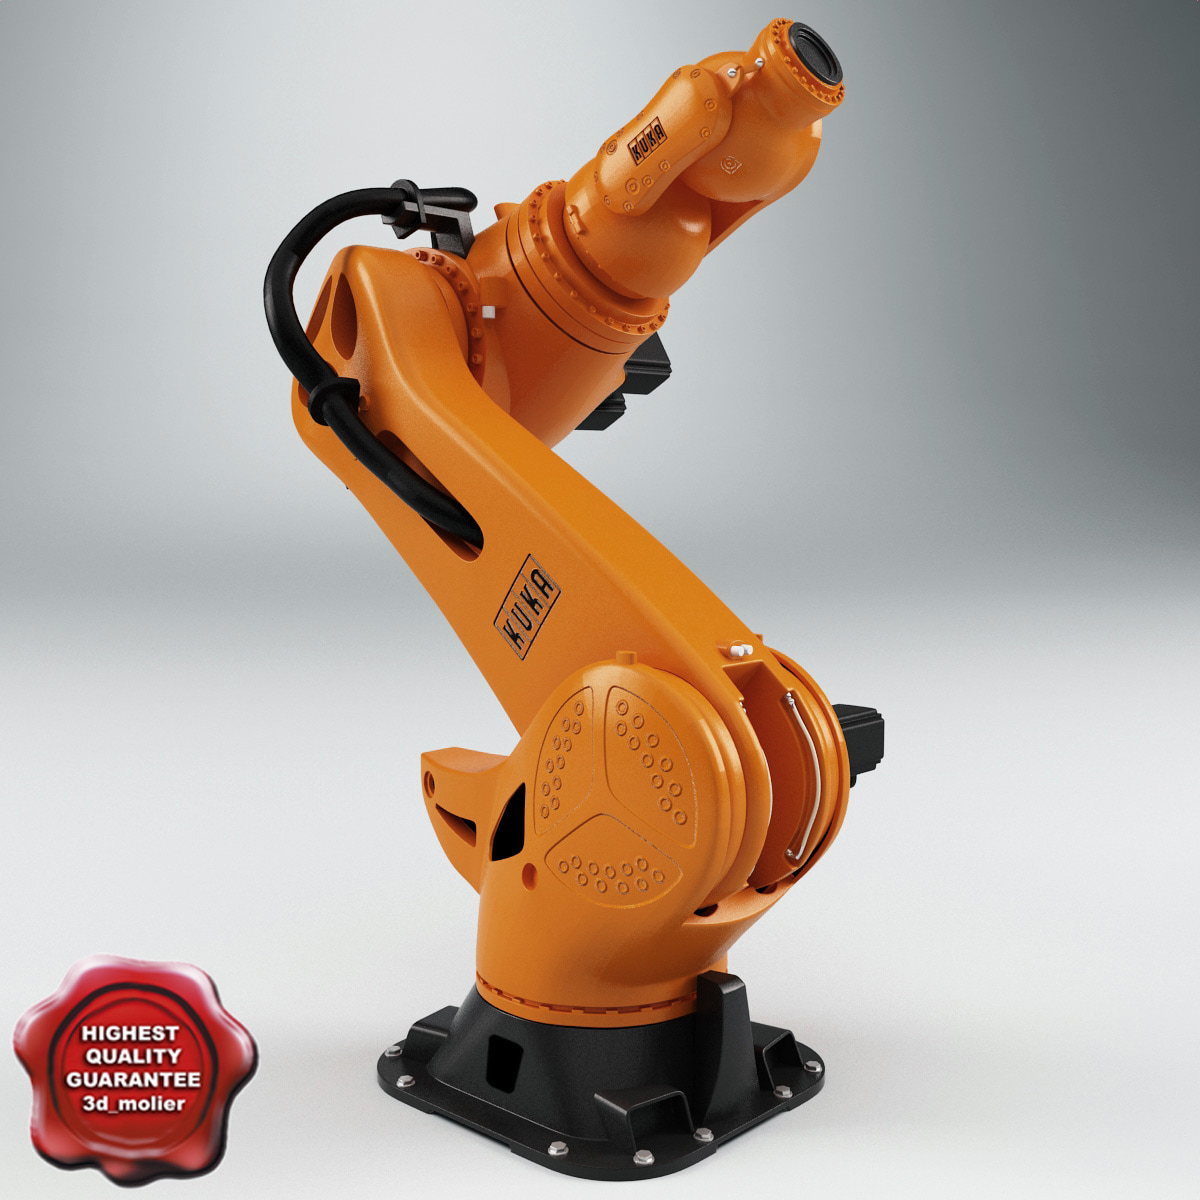 KUKA_KR_1000_titan_robot_00.jpg